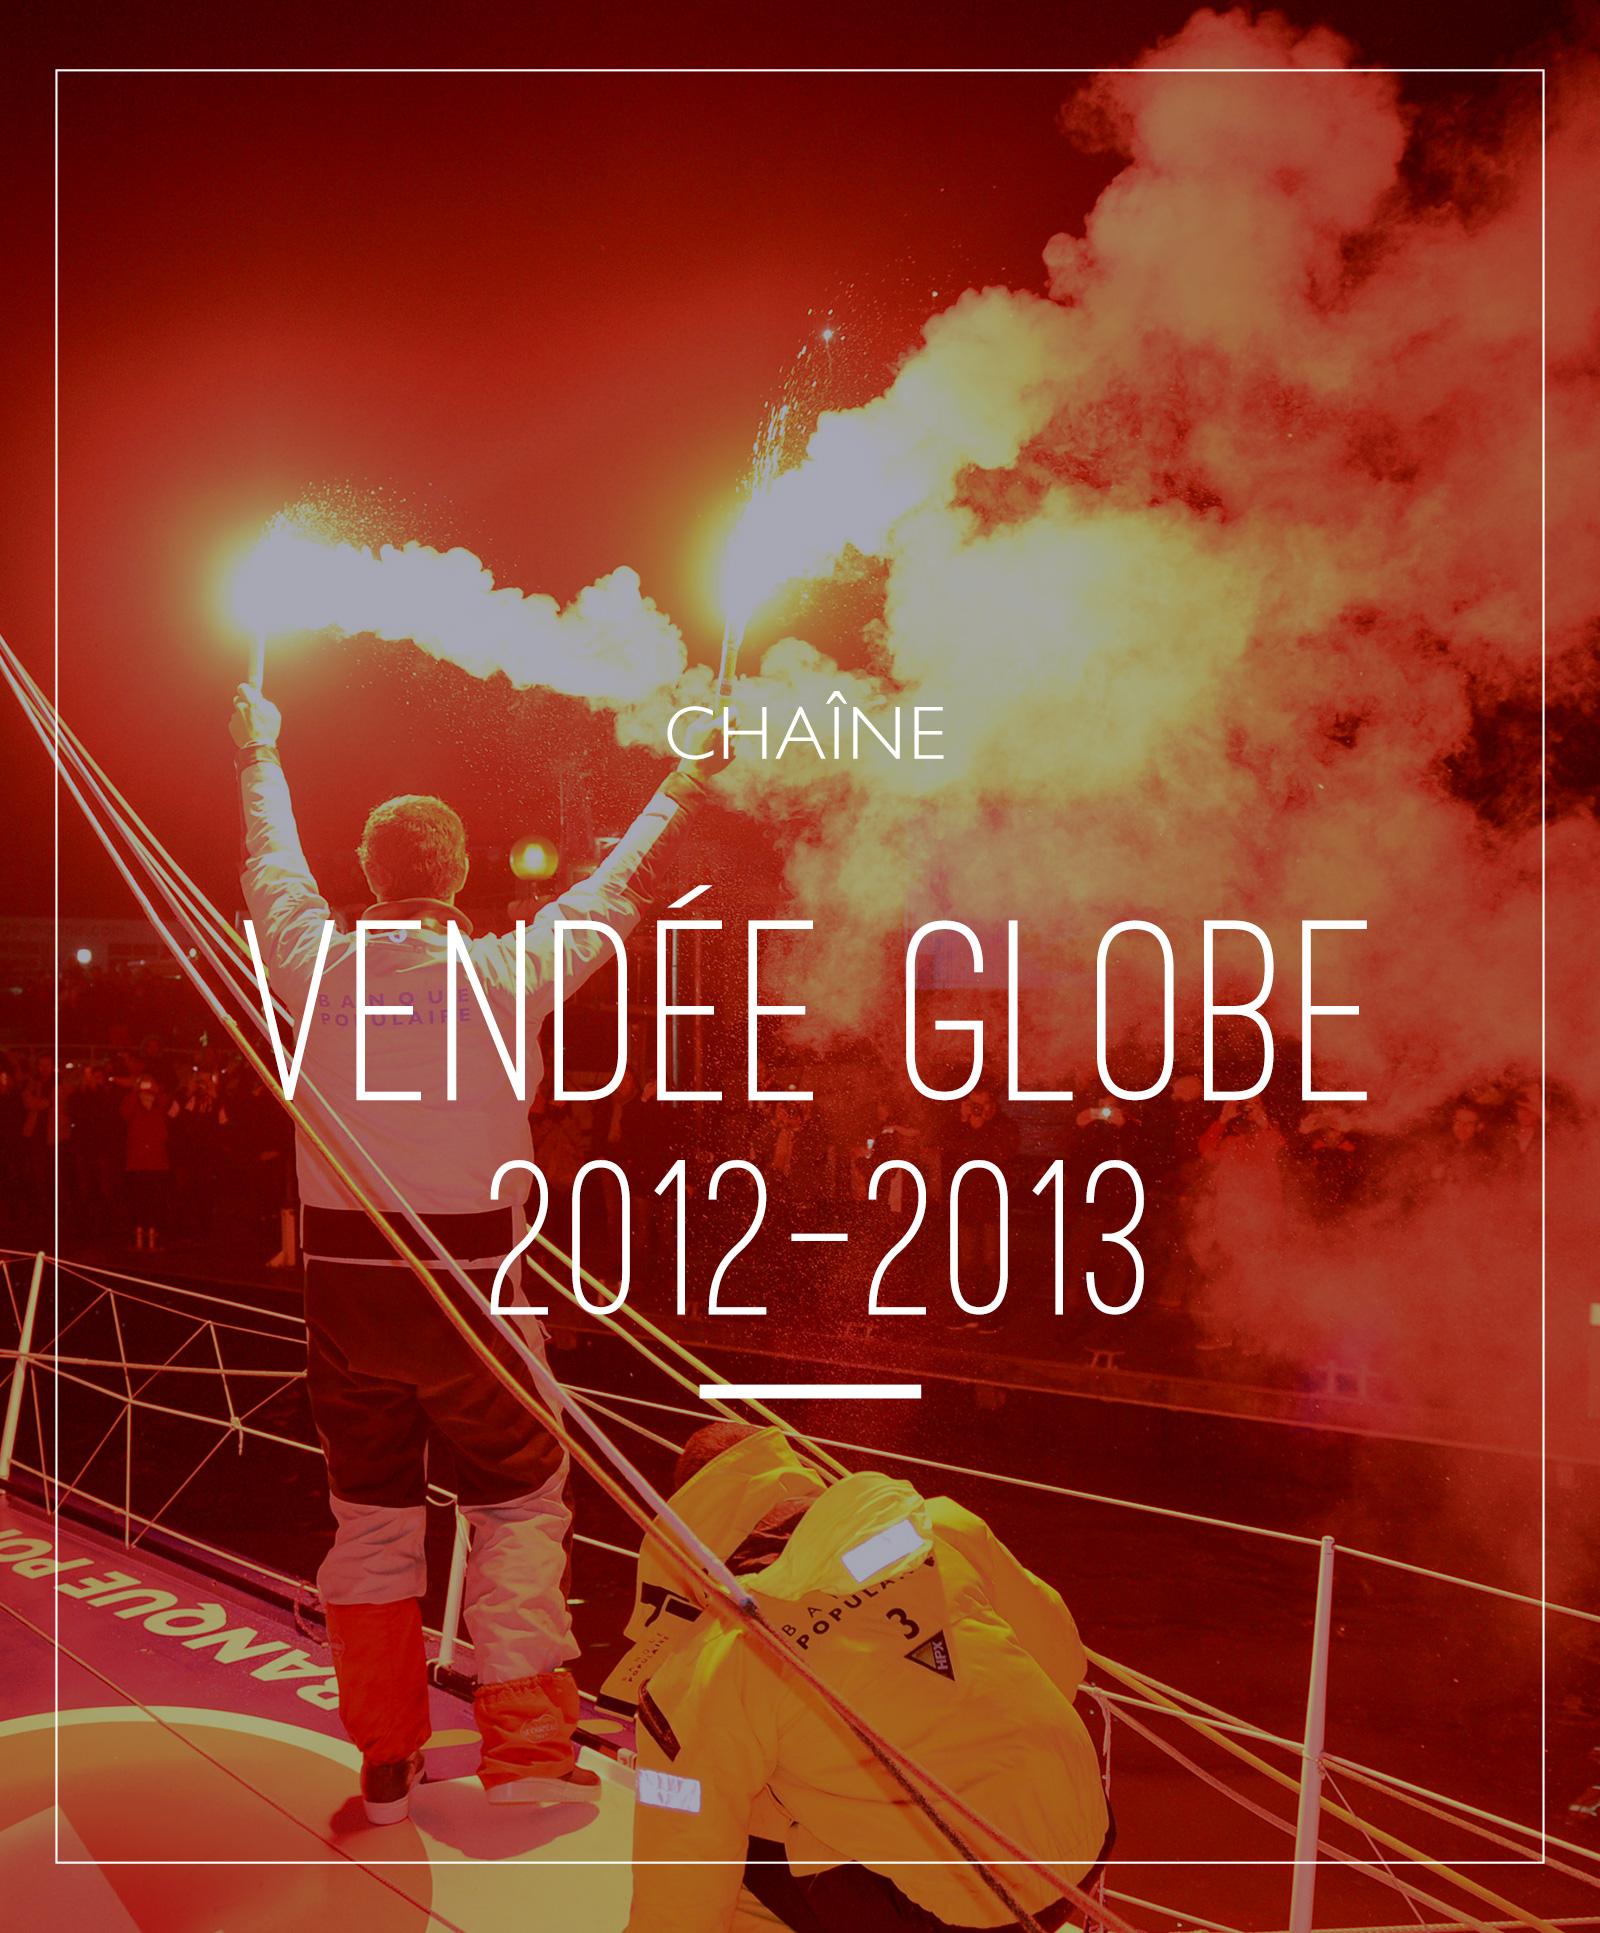 chaine Vendée Globe 2012-2013